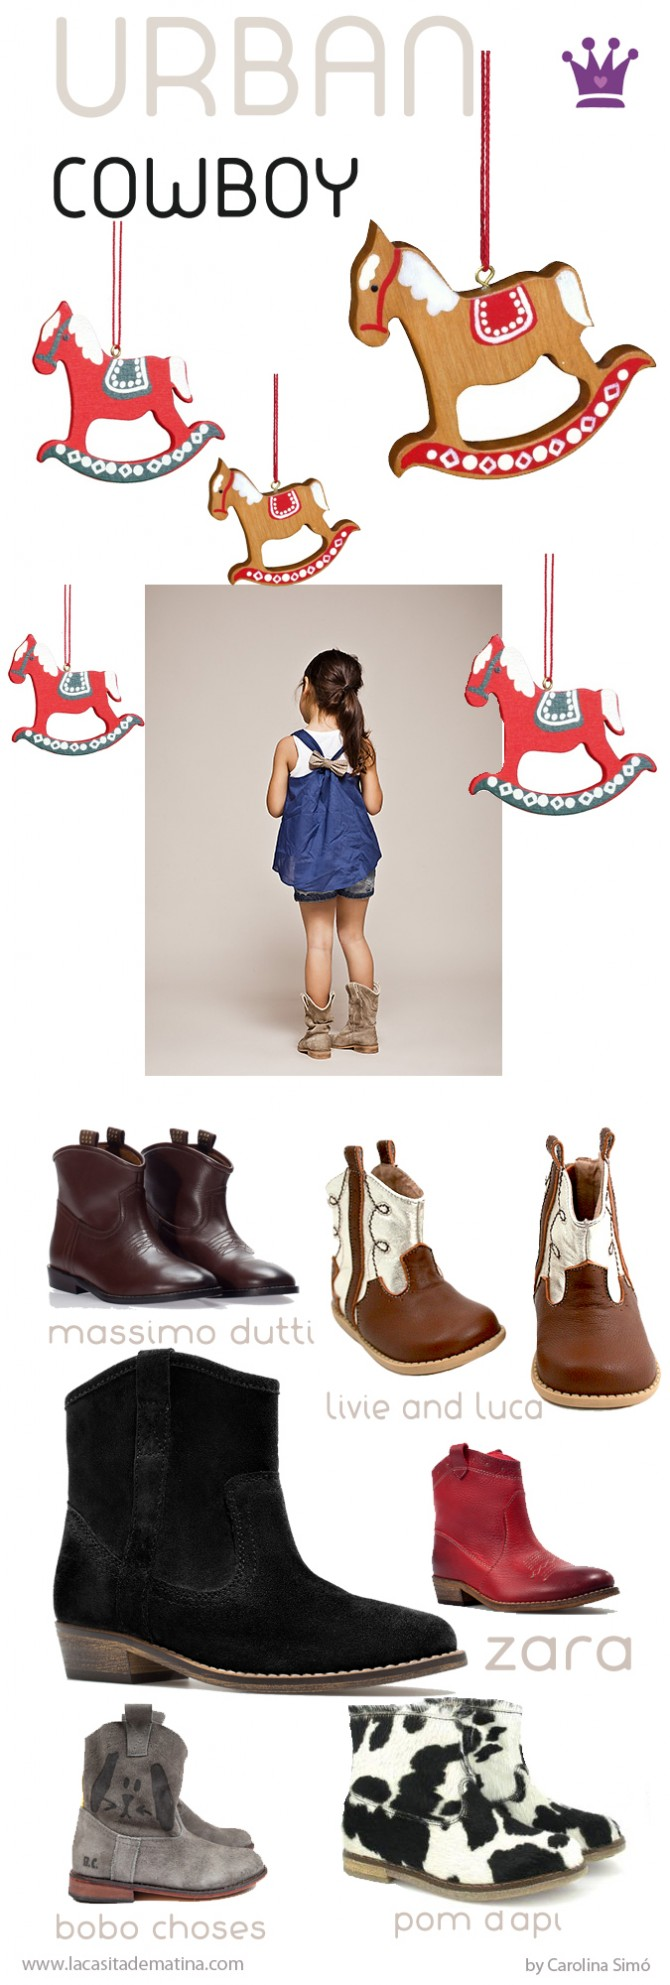 Tendencias moda infantil, La casita de Martina, Blog Moda Infantil, Carolina Simó